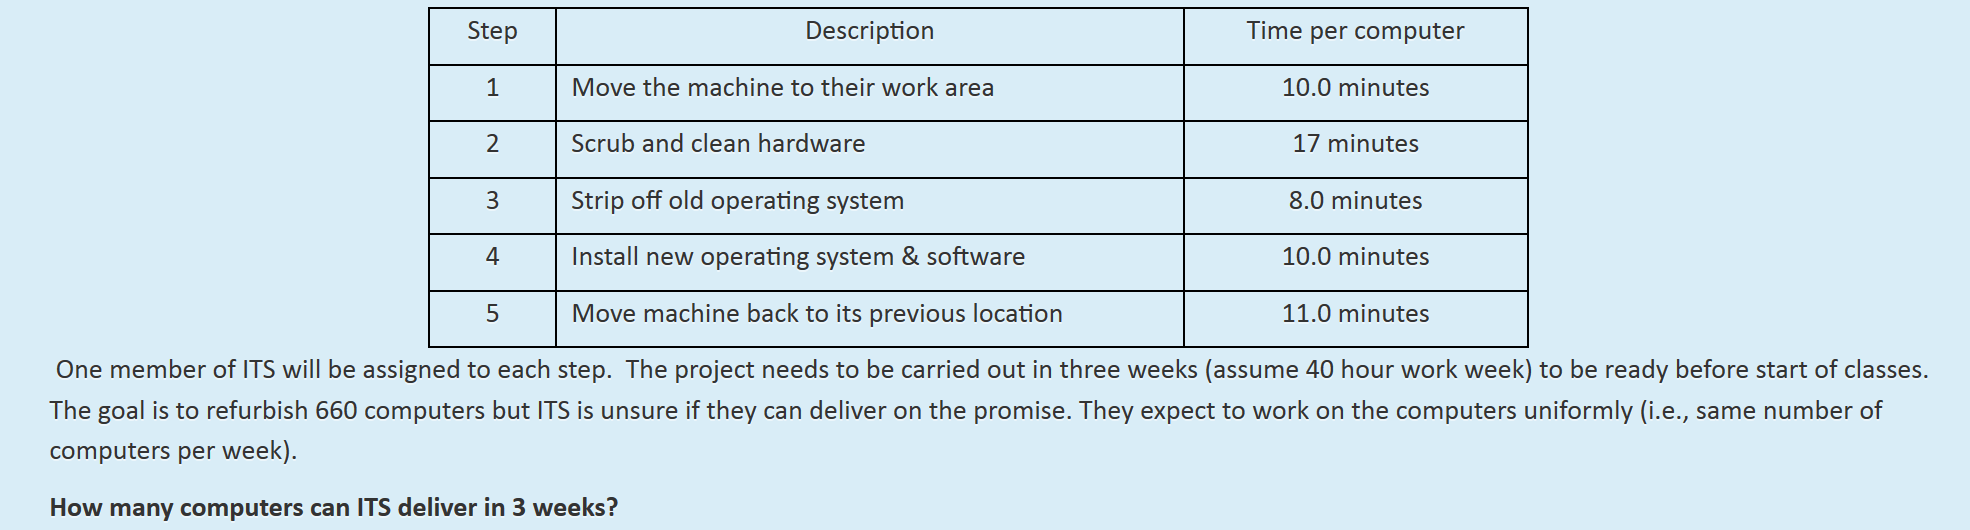 Operations Management Archive | September 22, 2015 | Chegg.com